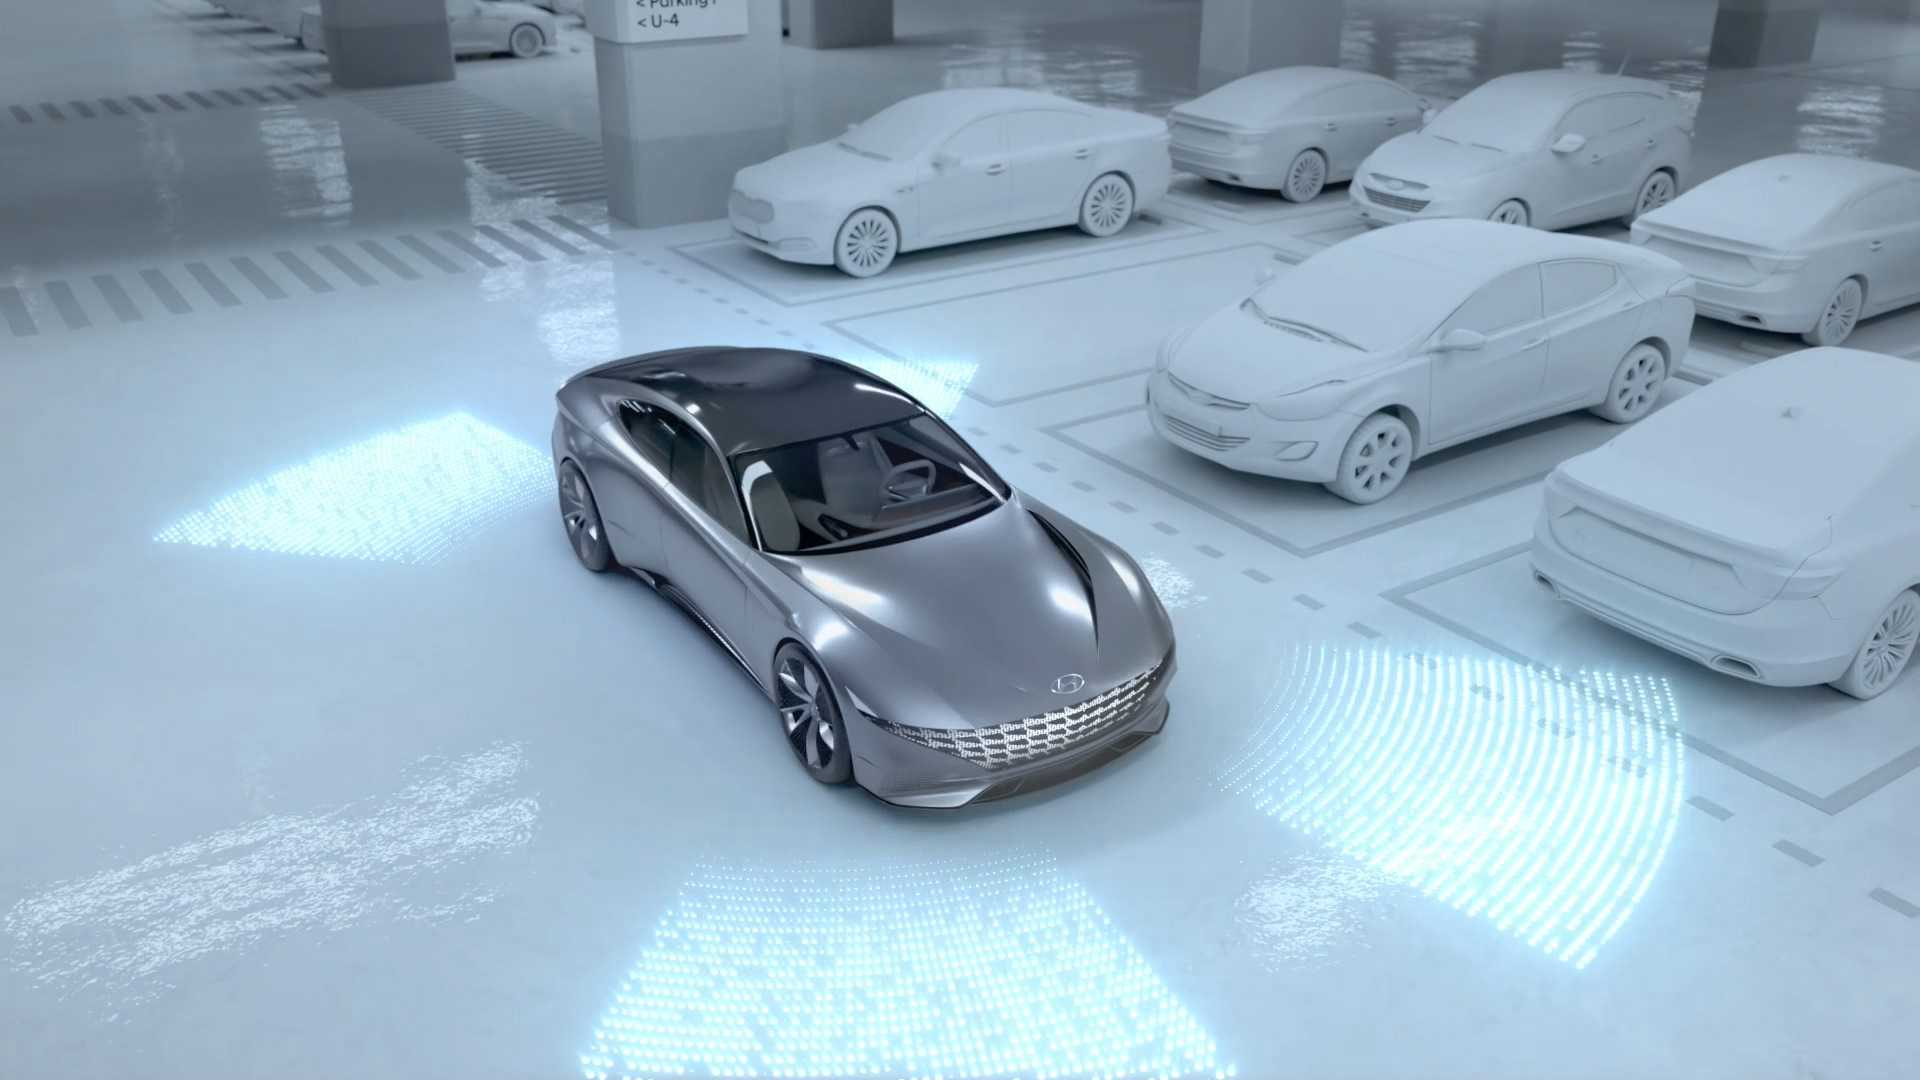 Hyundai-Kia Presents Automated Valet Parking & Charging Concept